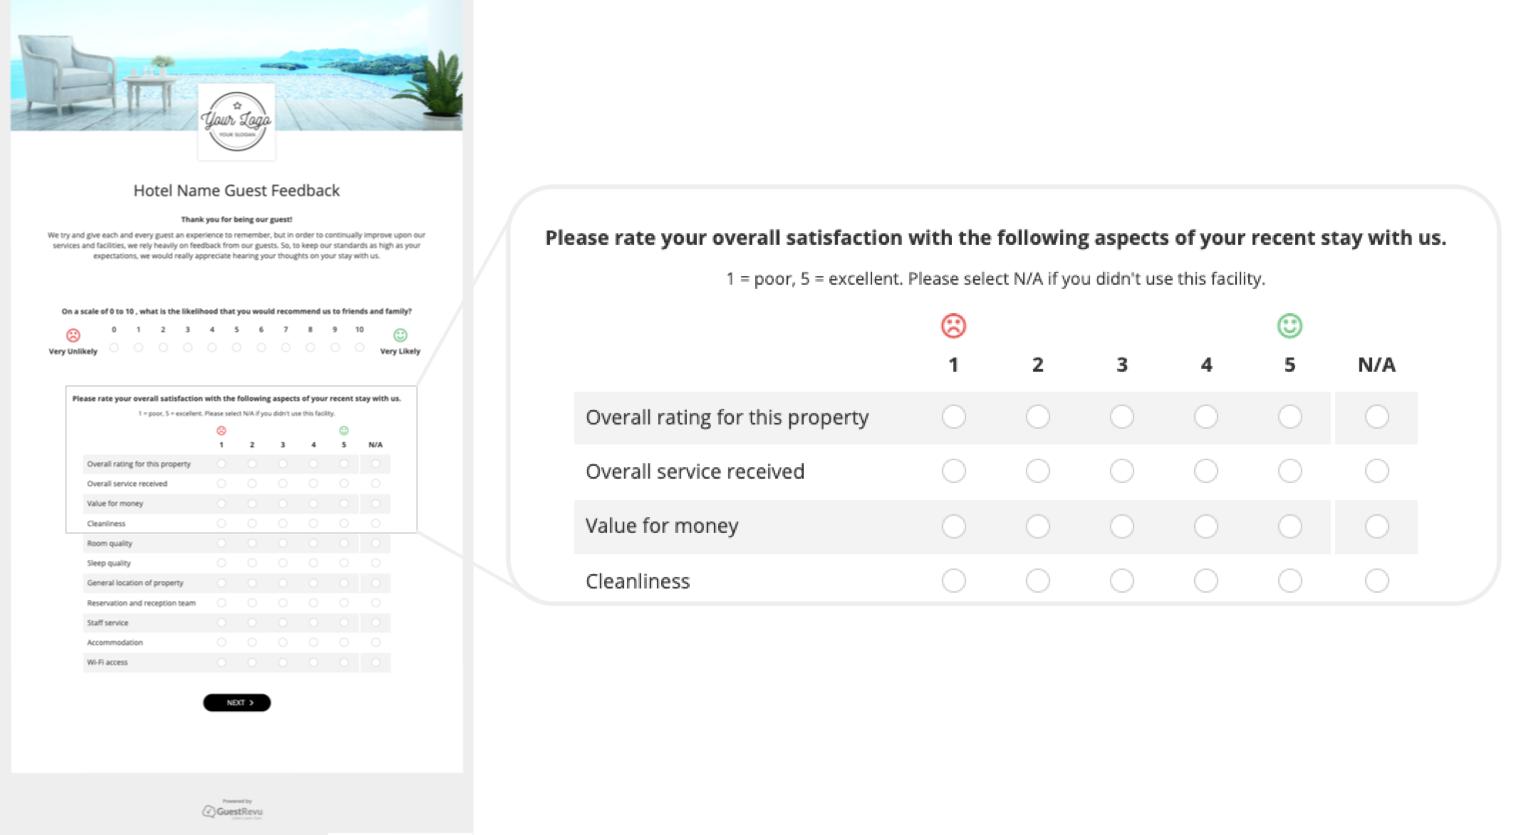 hotel-questionnaire-survey-guestrevu-five-point-rating